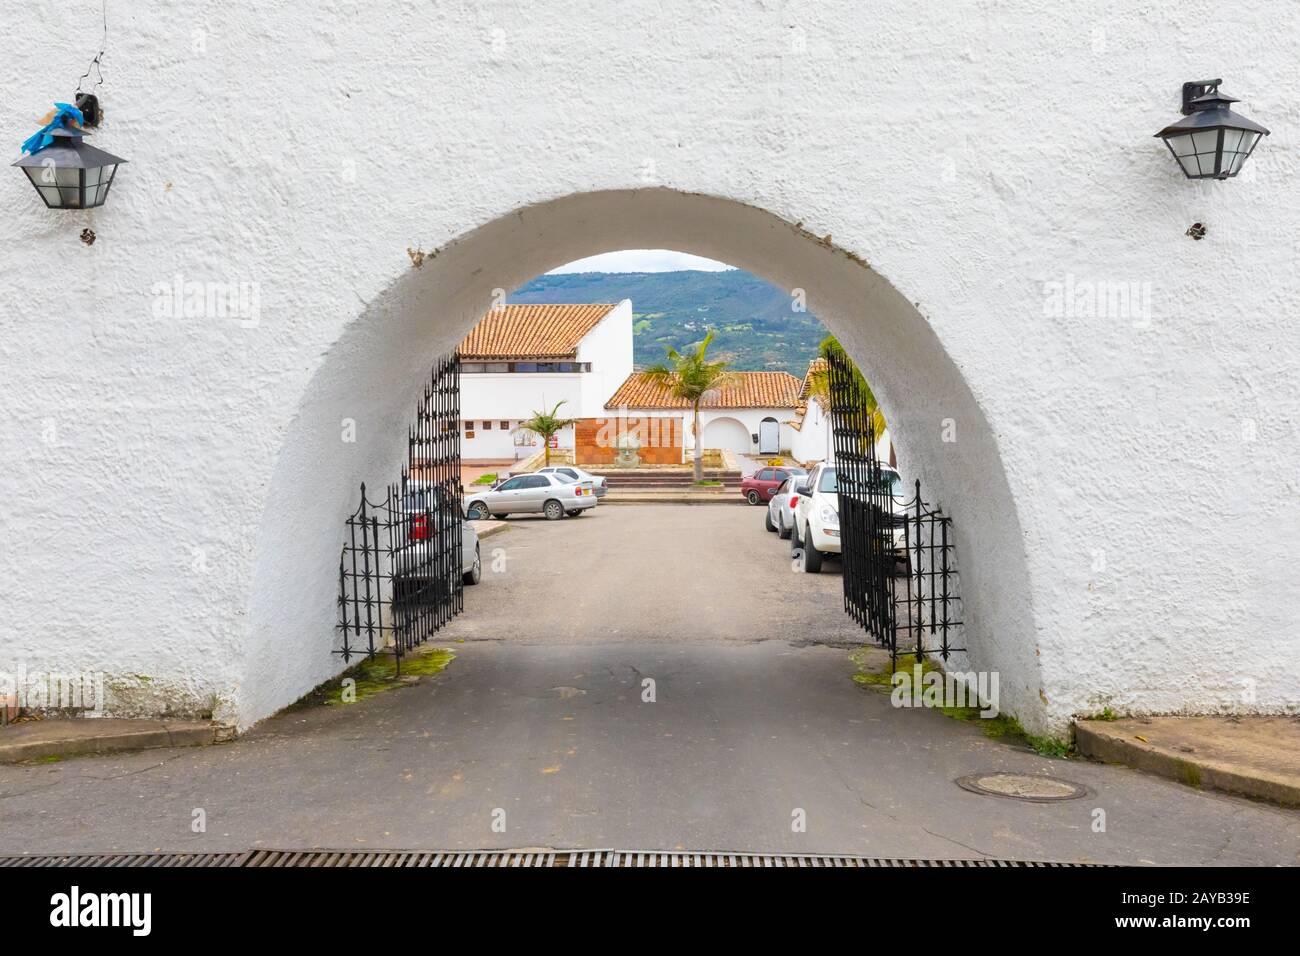 Colombia Guatavita arco de entrada del centro histórico Foto de stock